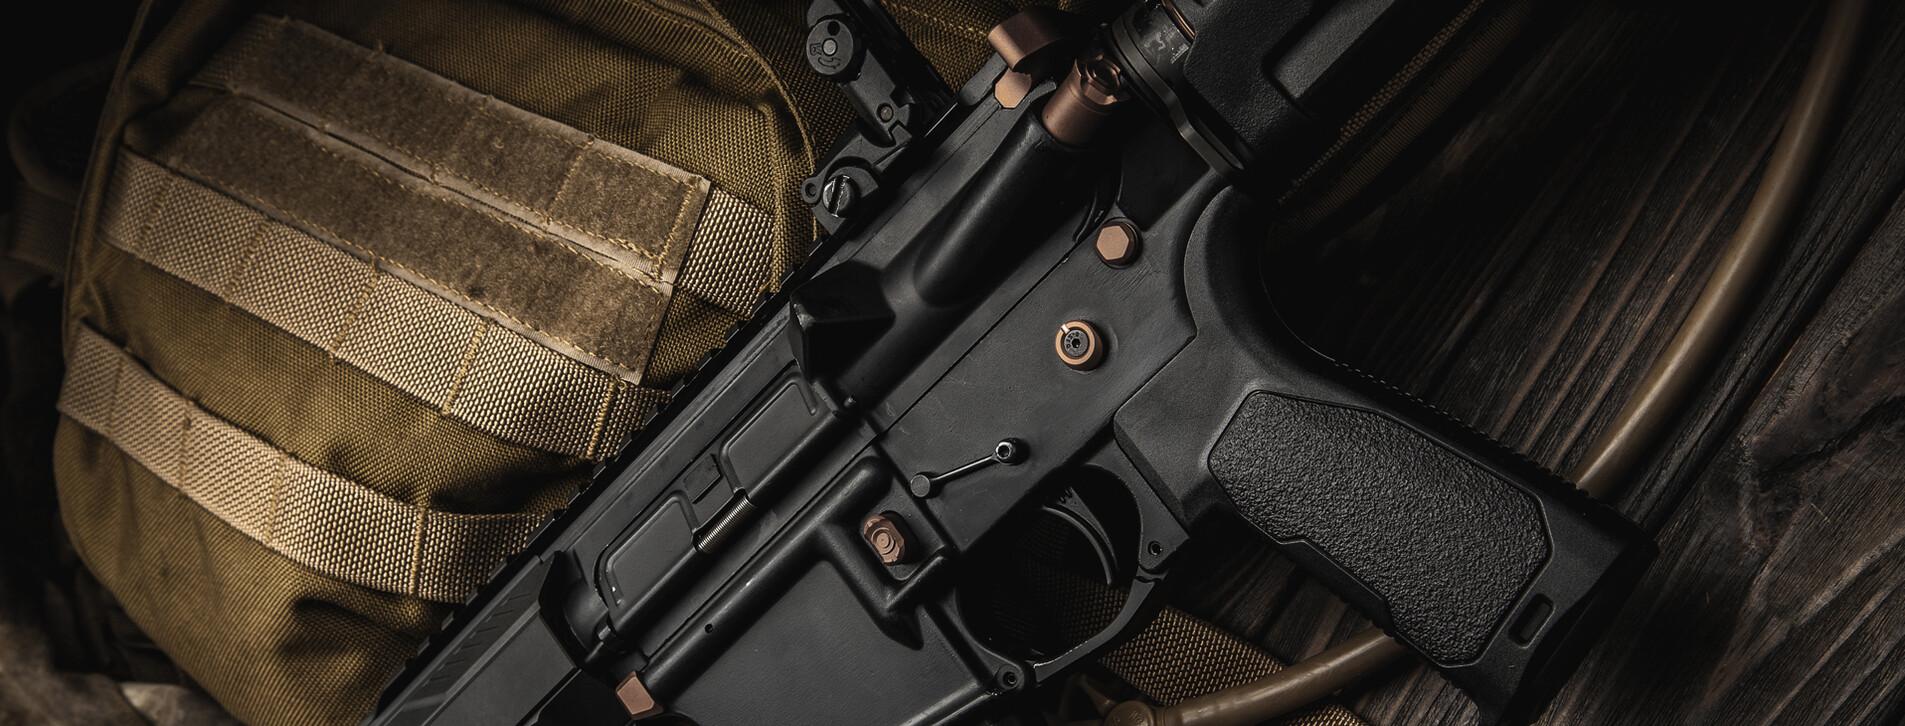 Фото 1 - Стрельба из карабина